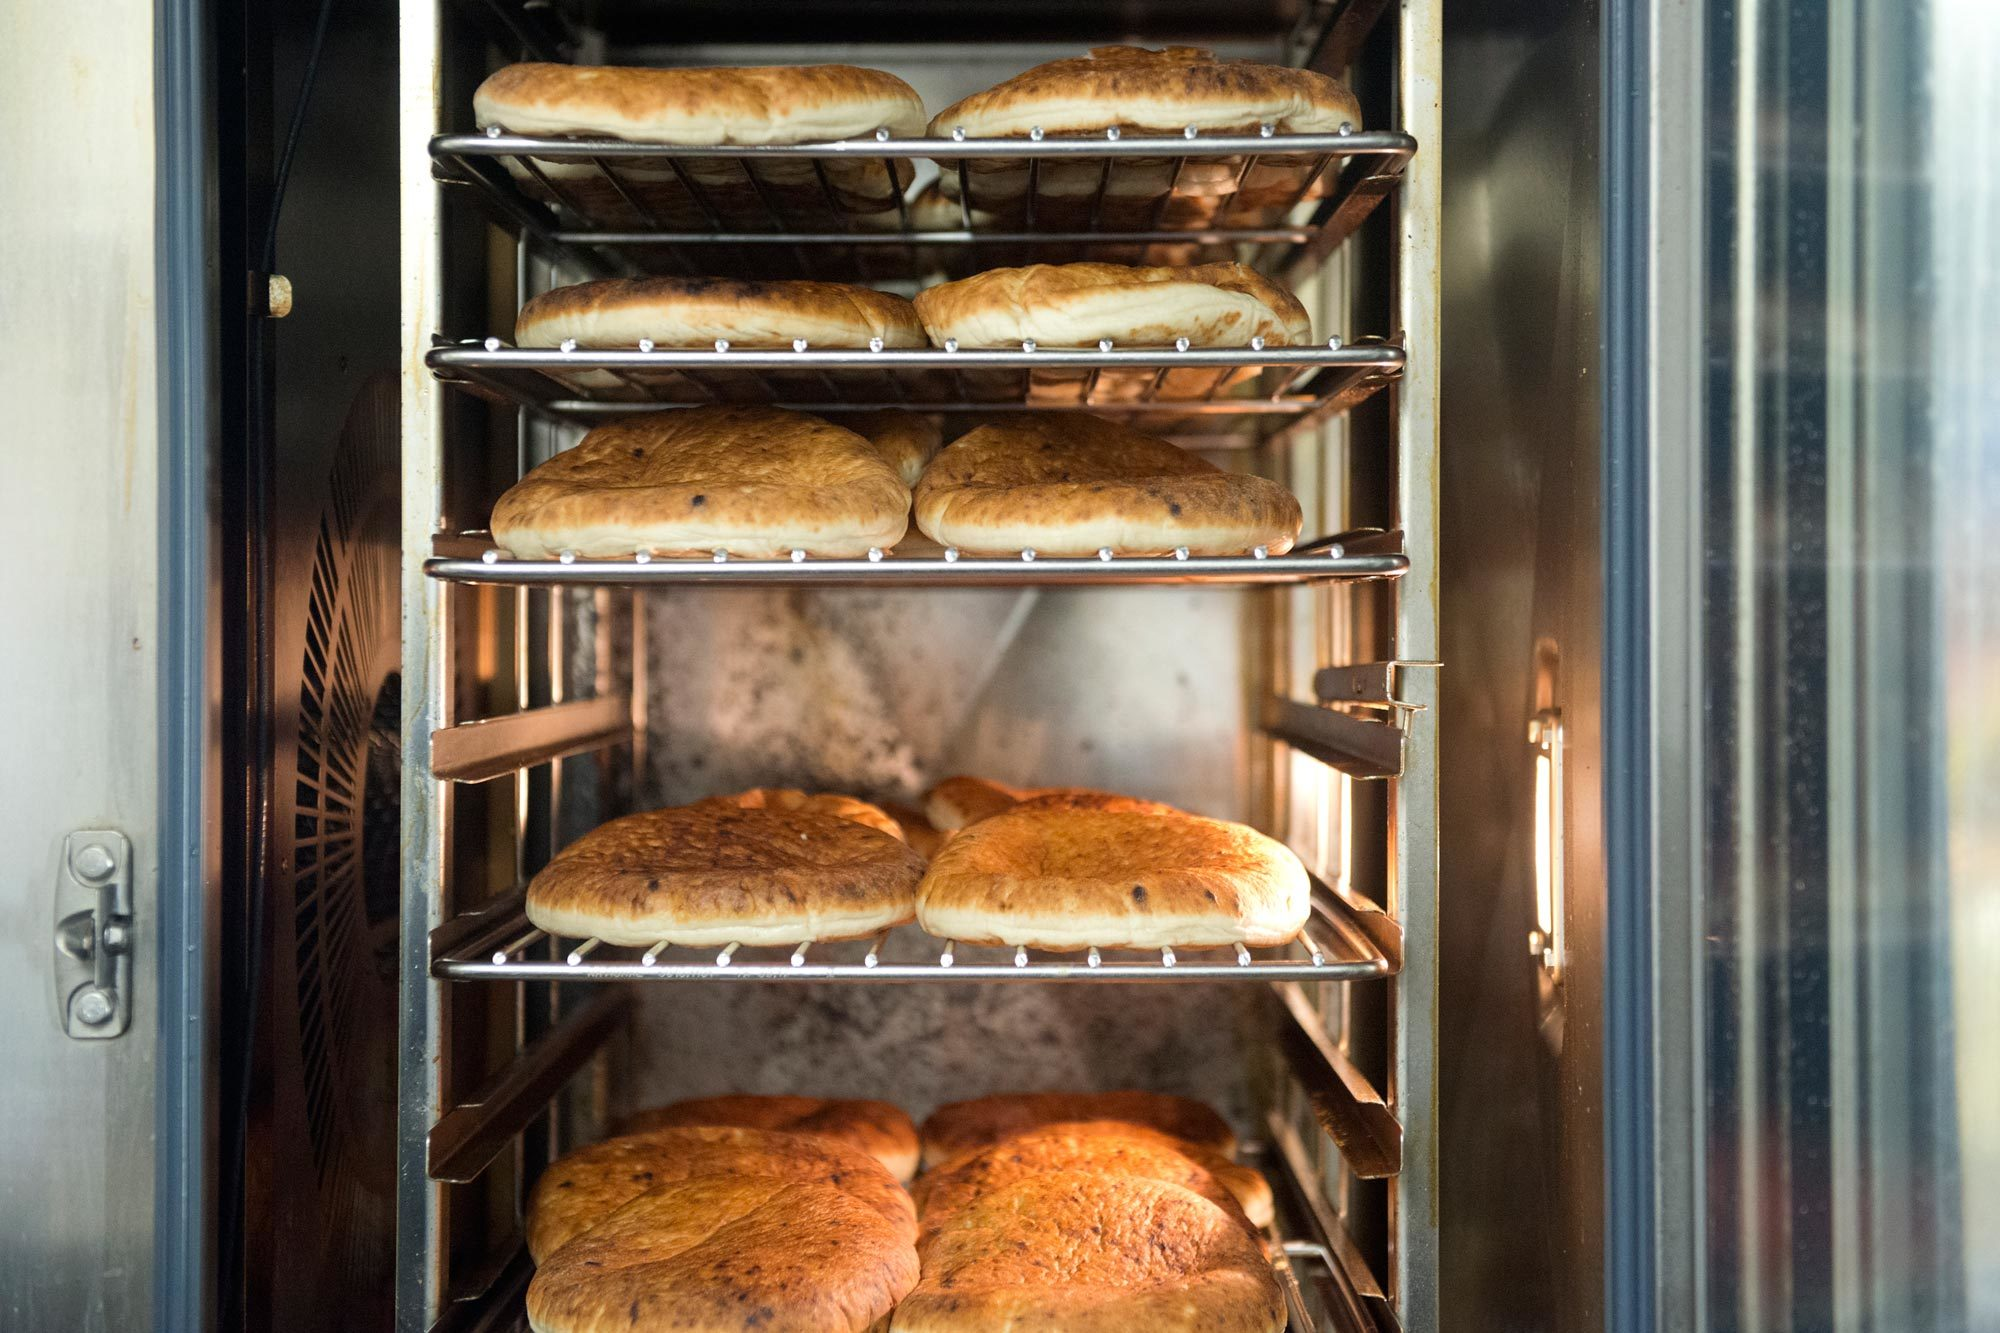 Article-Pita-Bread-Factory-Angel-Bakeries-Miznon